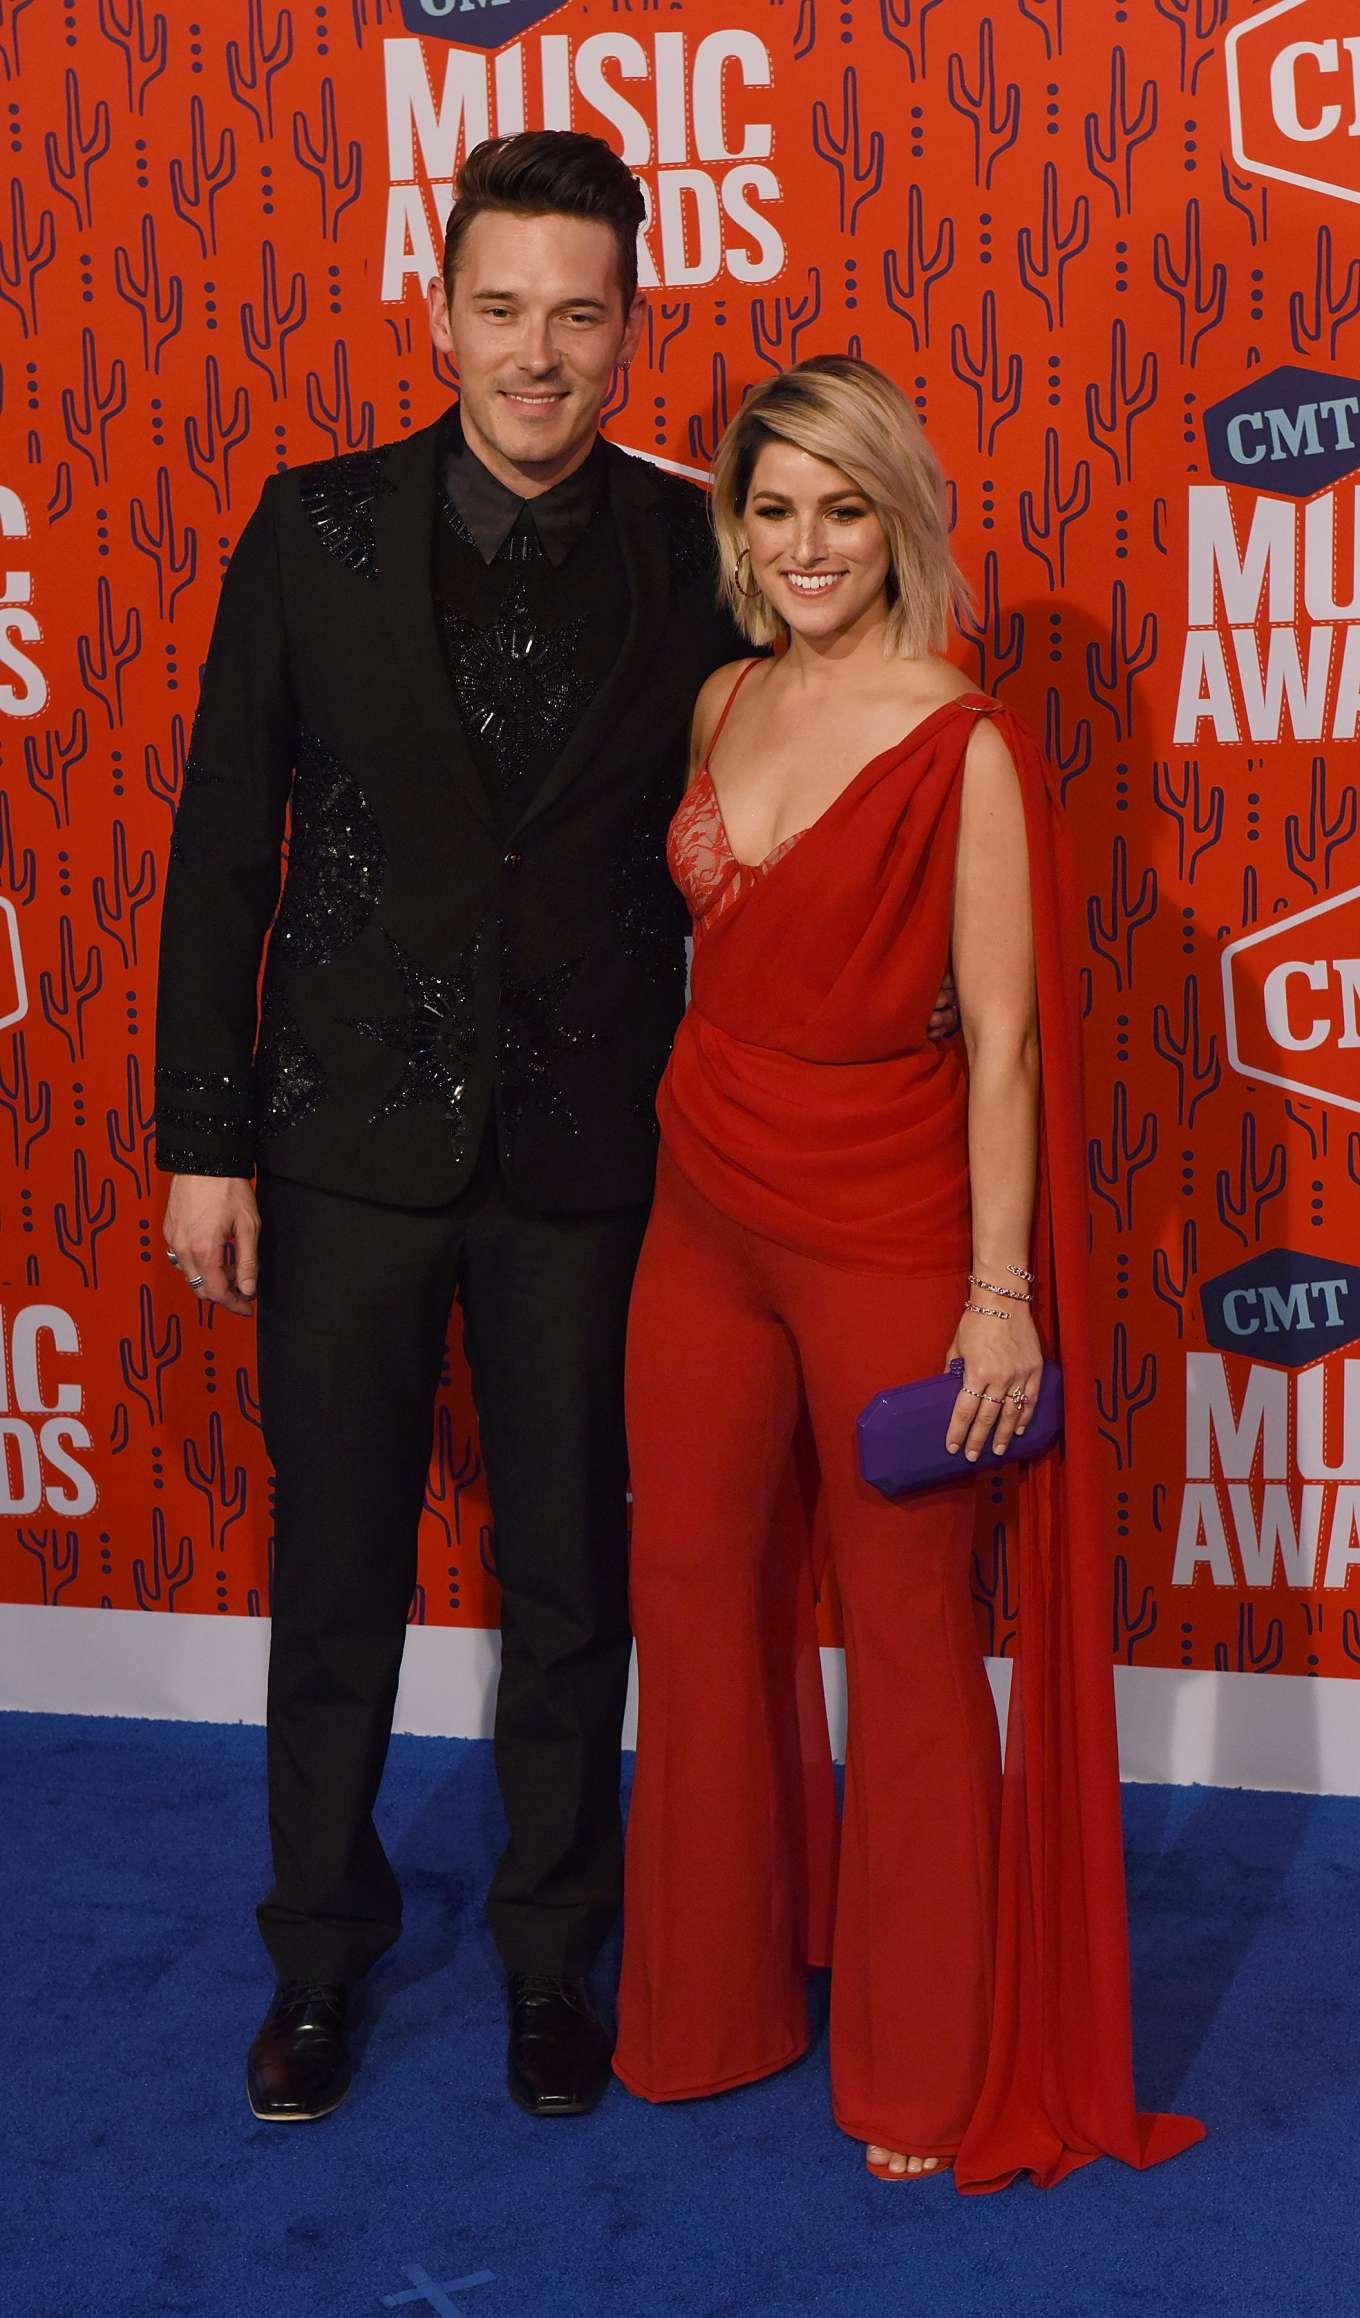 Cassadee Pope 2019 : Cassadee Pope: 2019 CMT Music Awards-14